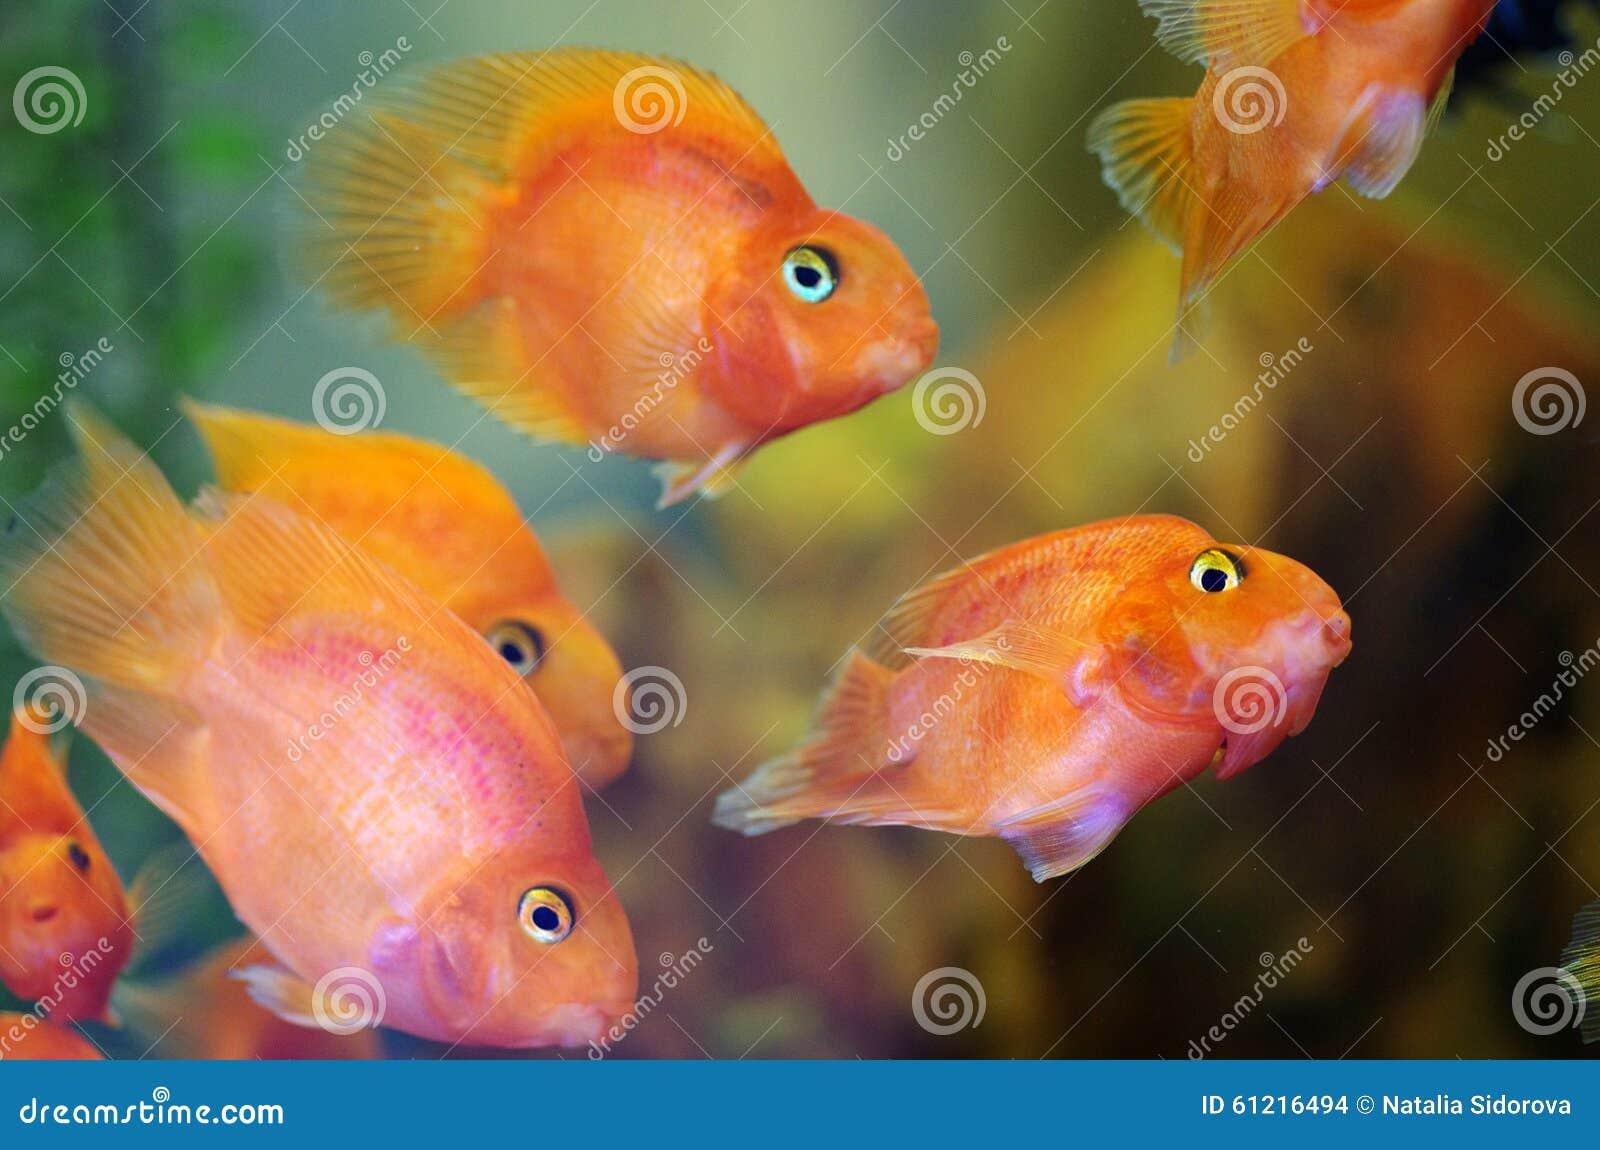 blood red parrot cichlid aquarium fish stock photo image of colors